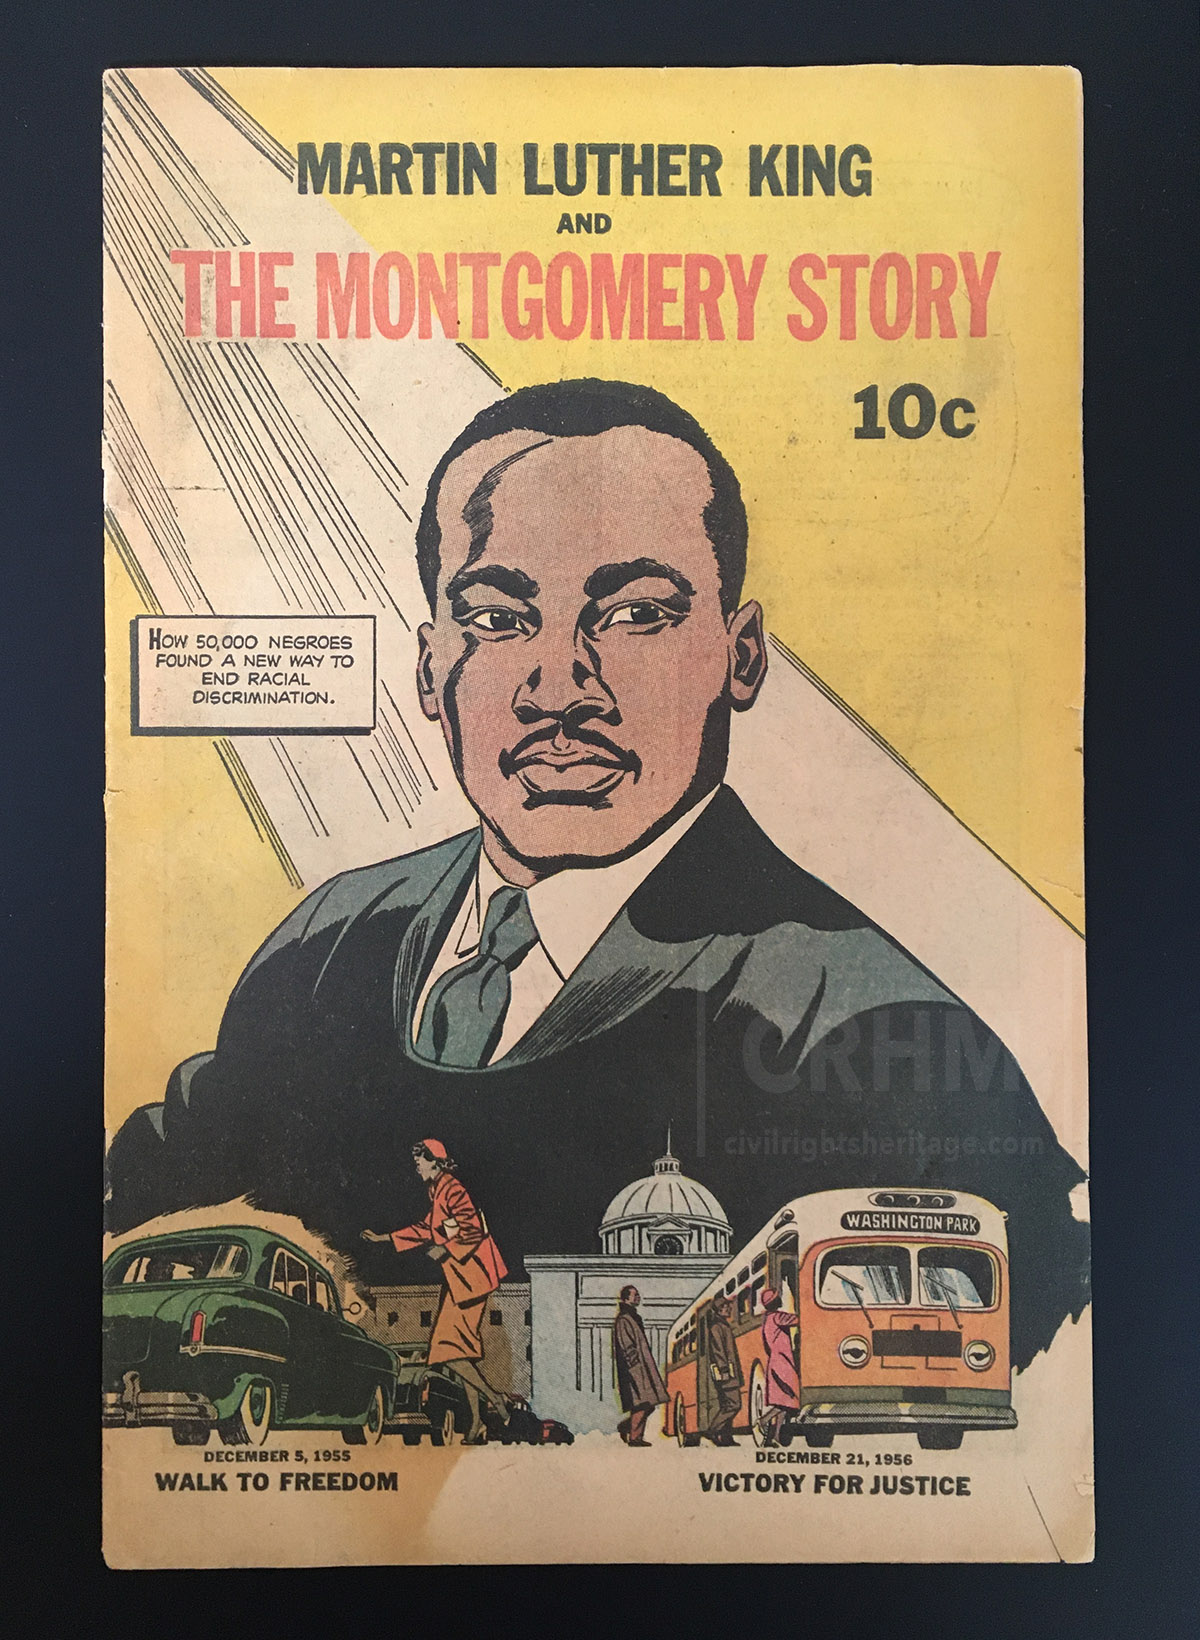 MLK-King-Montgomery-Story-Comic-2-WM